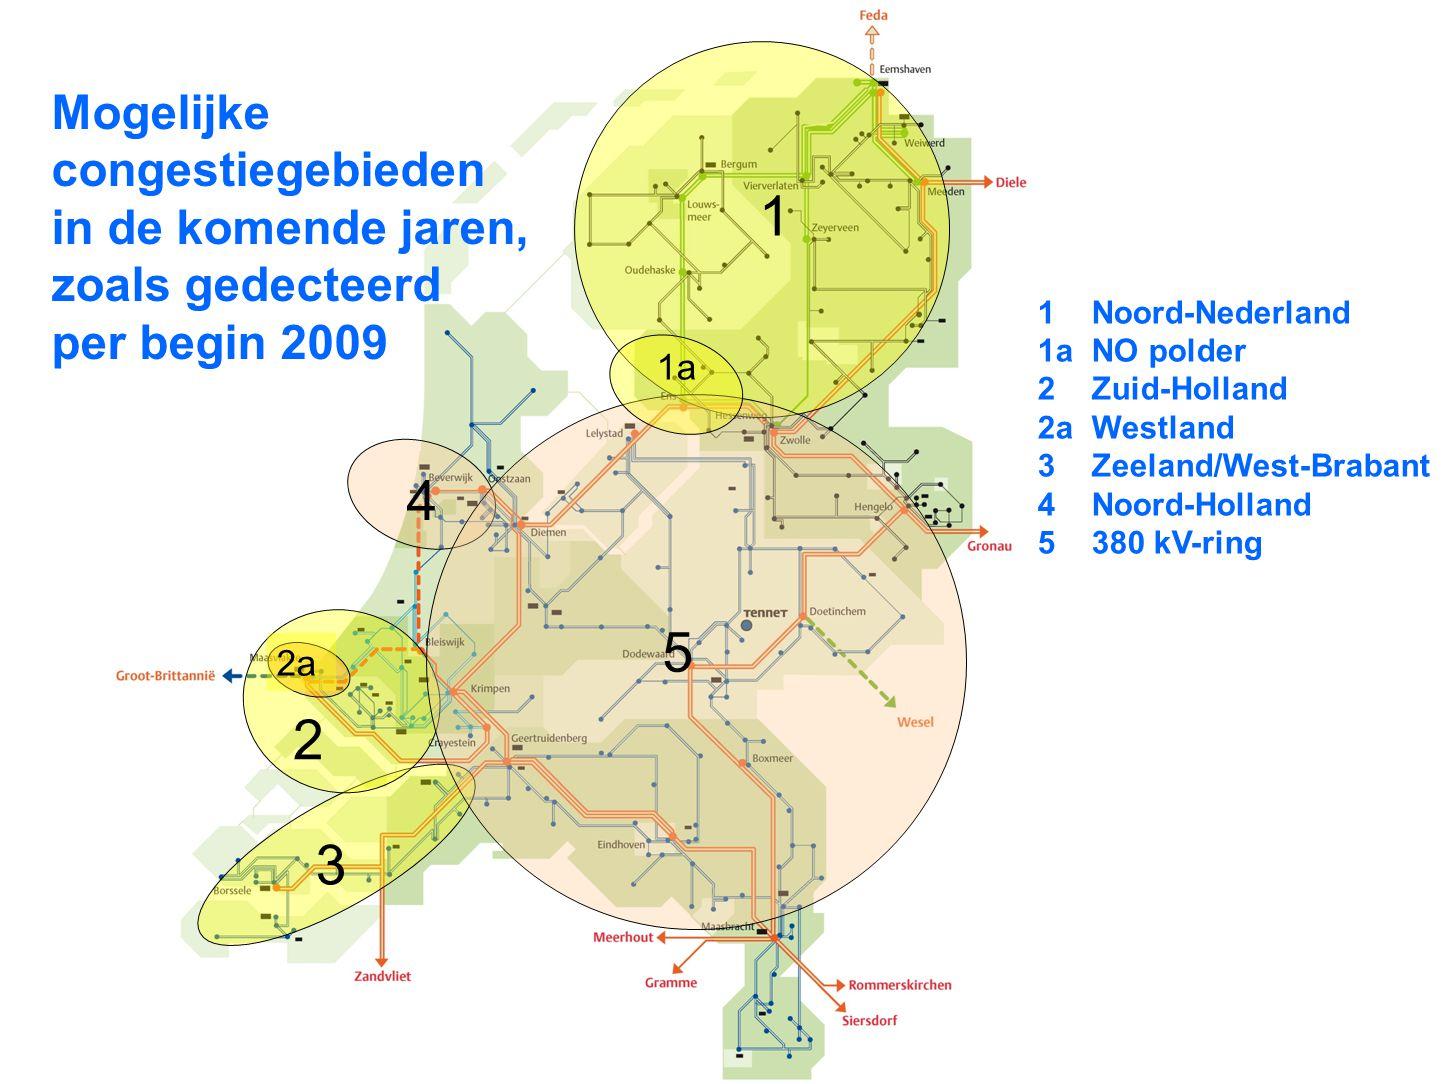 16 1 2 3 4 2a 5 1a 1Noord-Nederland 1aNO polder 2Zuid-Holland 2aWestland 3Zeeland/West-Brabant 4Noord-Holland 5380 kV-ring Mogelijke congestiegebieden